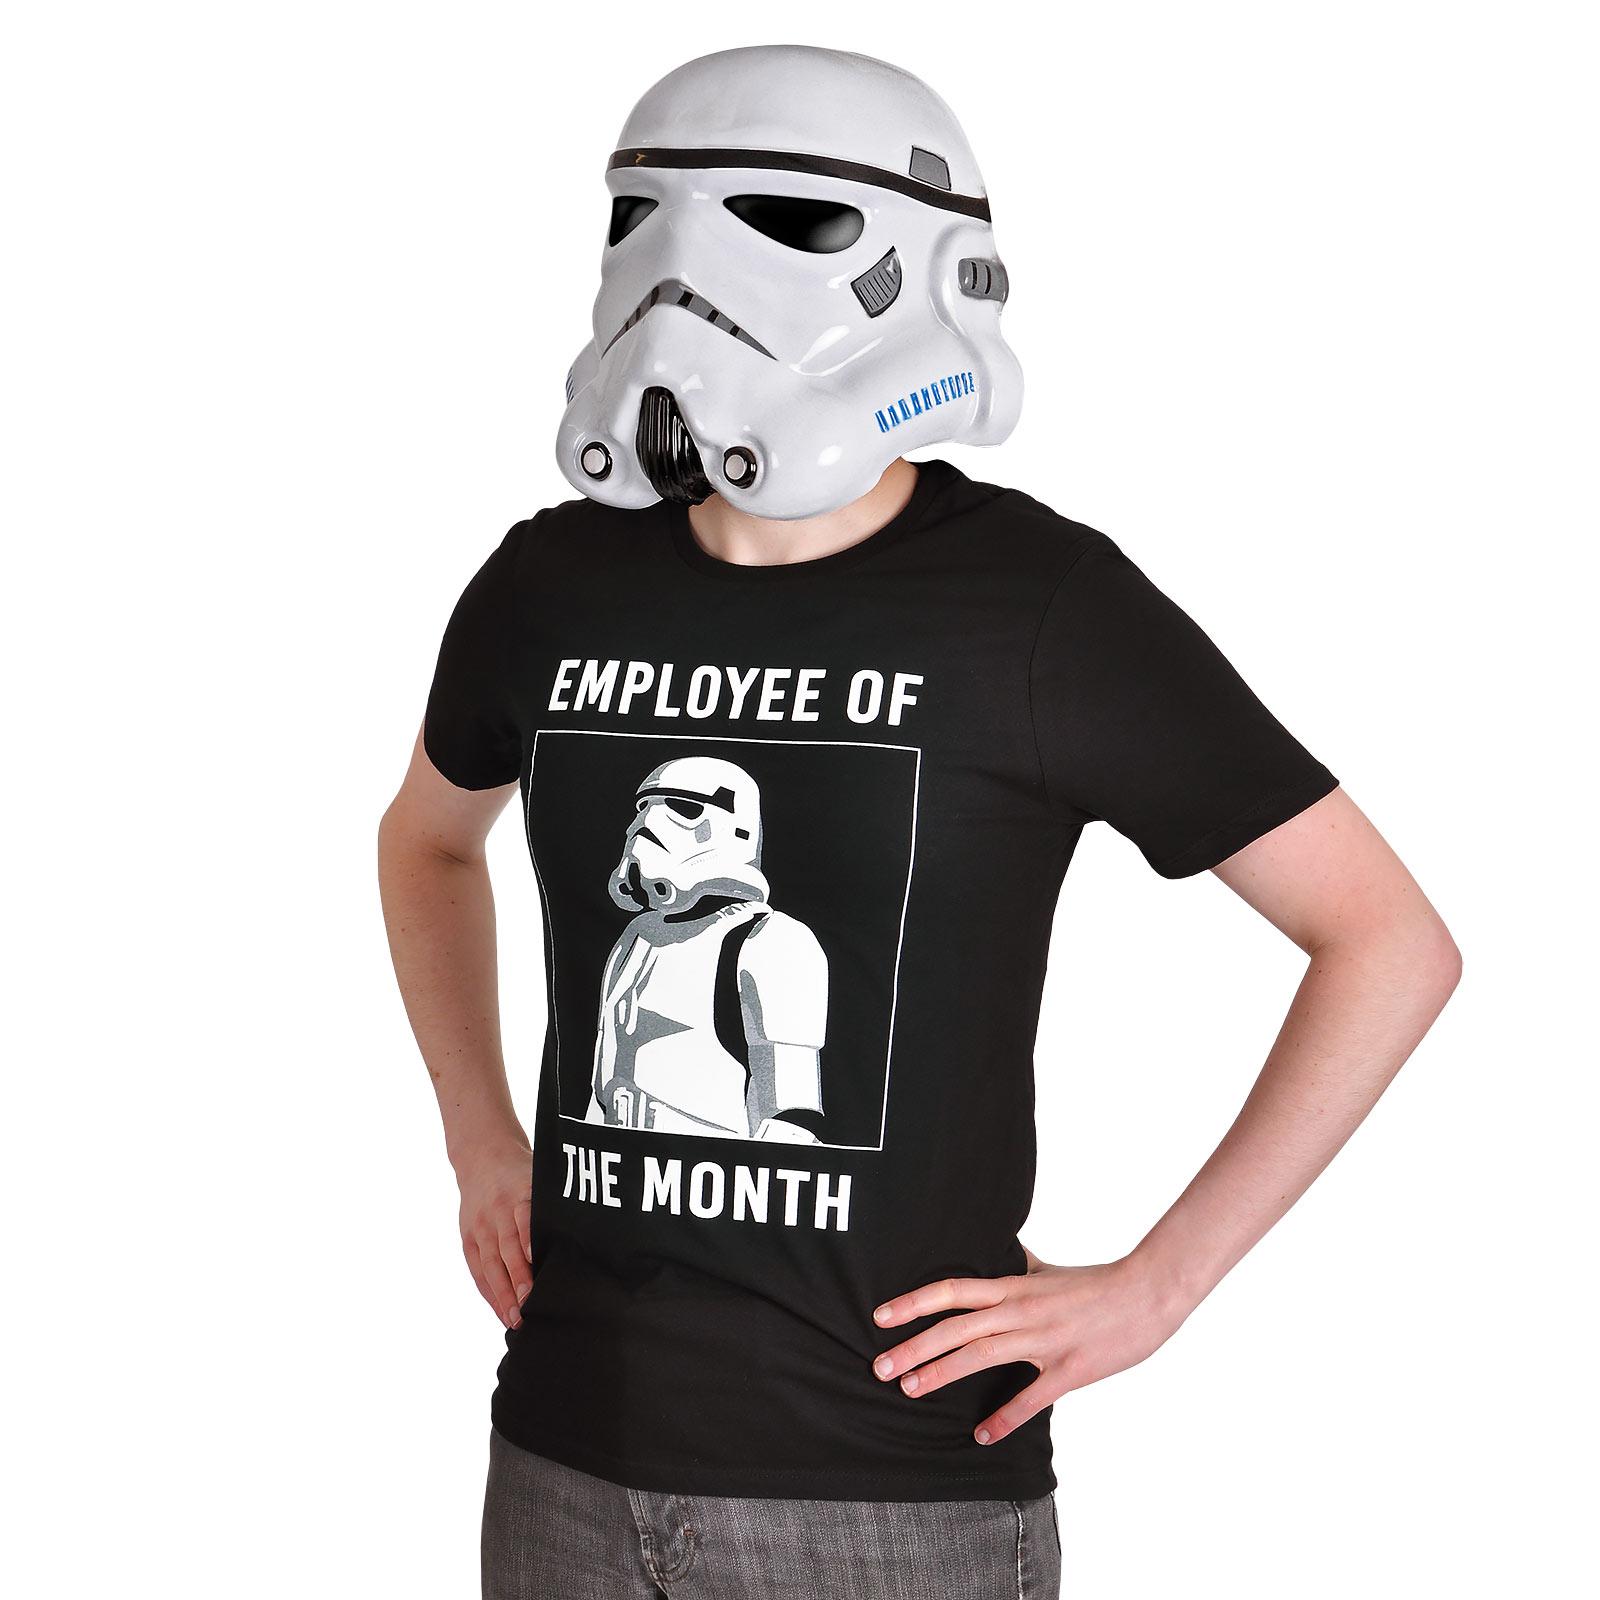 Star Wars - Stormtrooper Employee of the Month T-Shirt schwarz